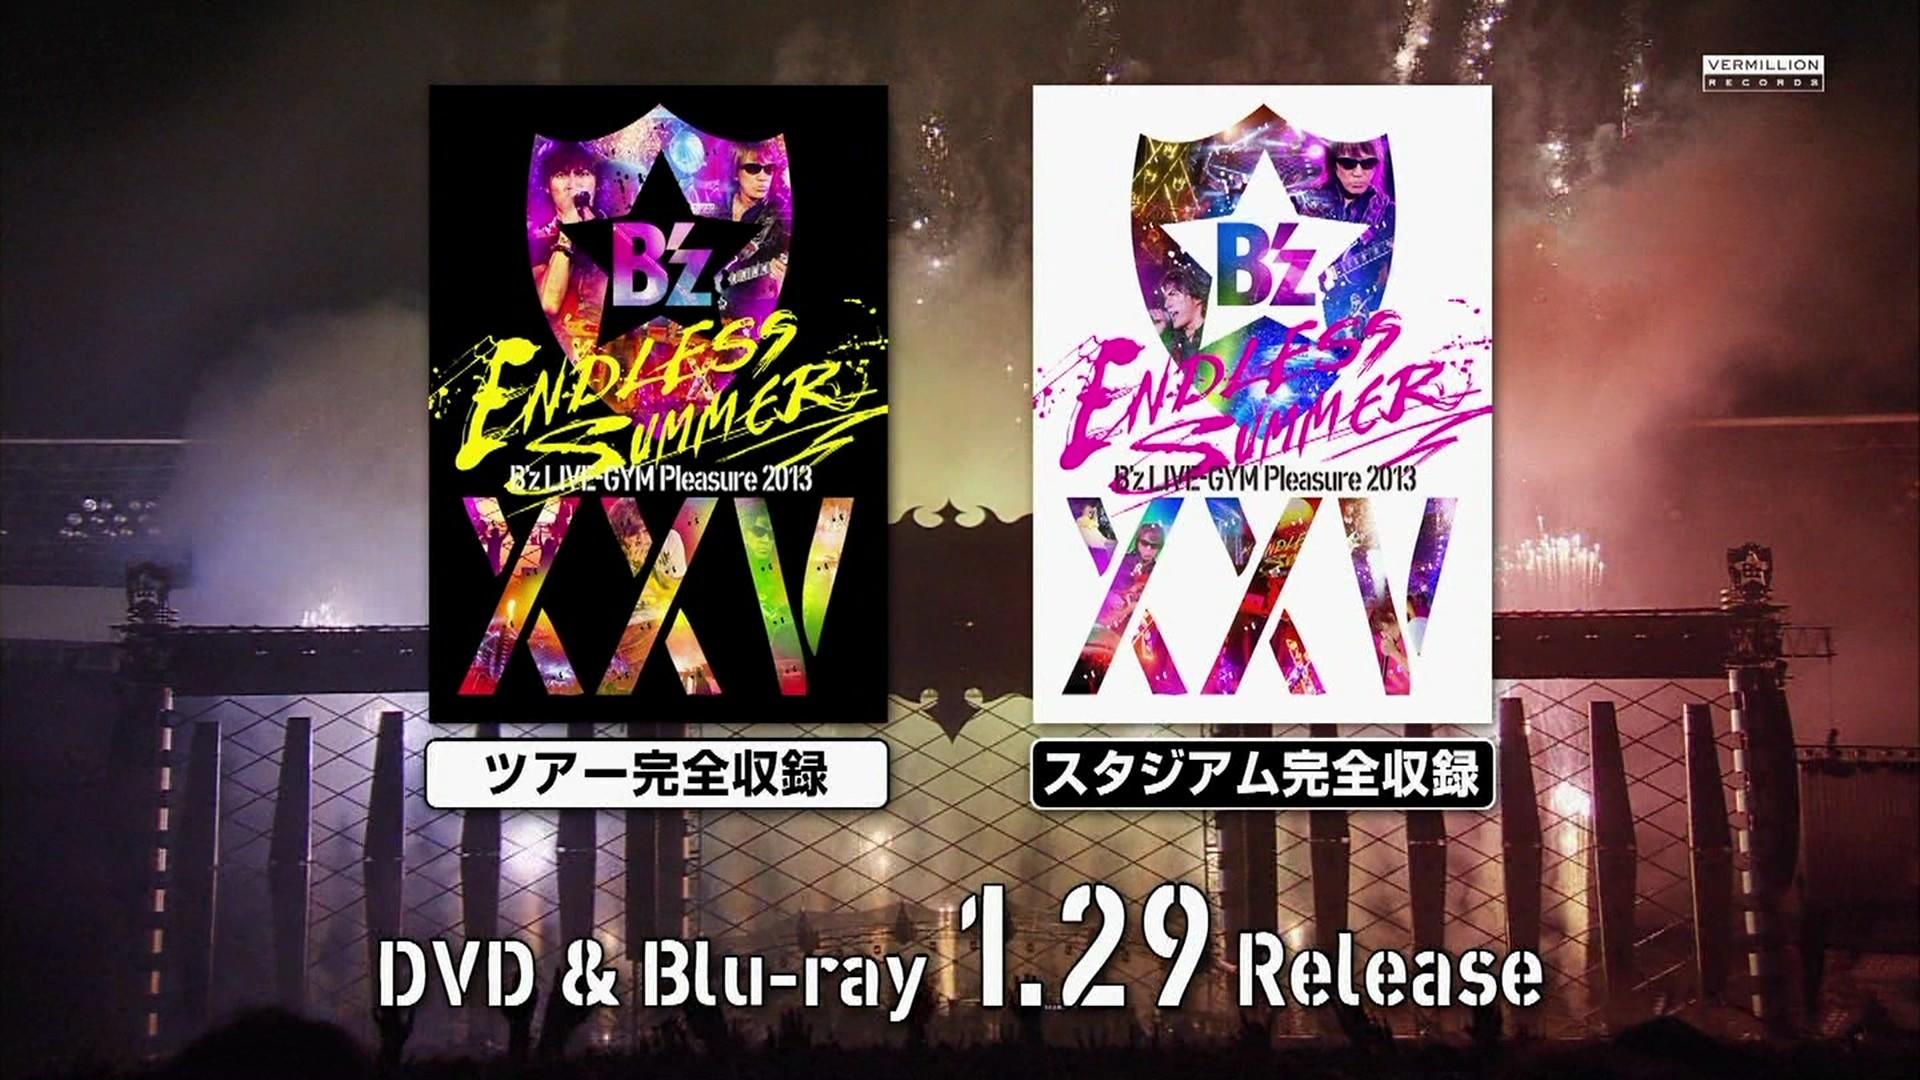 DVD & Blu-ray B'z LIVE-GYM Pleasure 2013-ENDLESS SUMMER ...